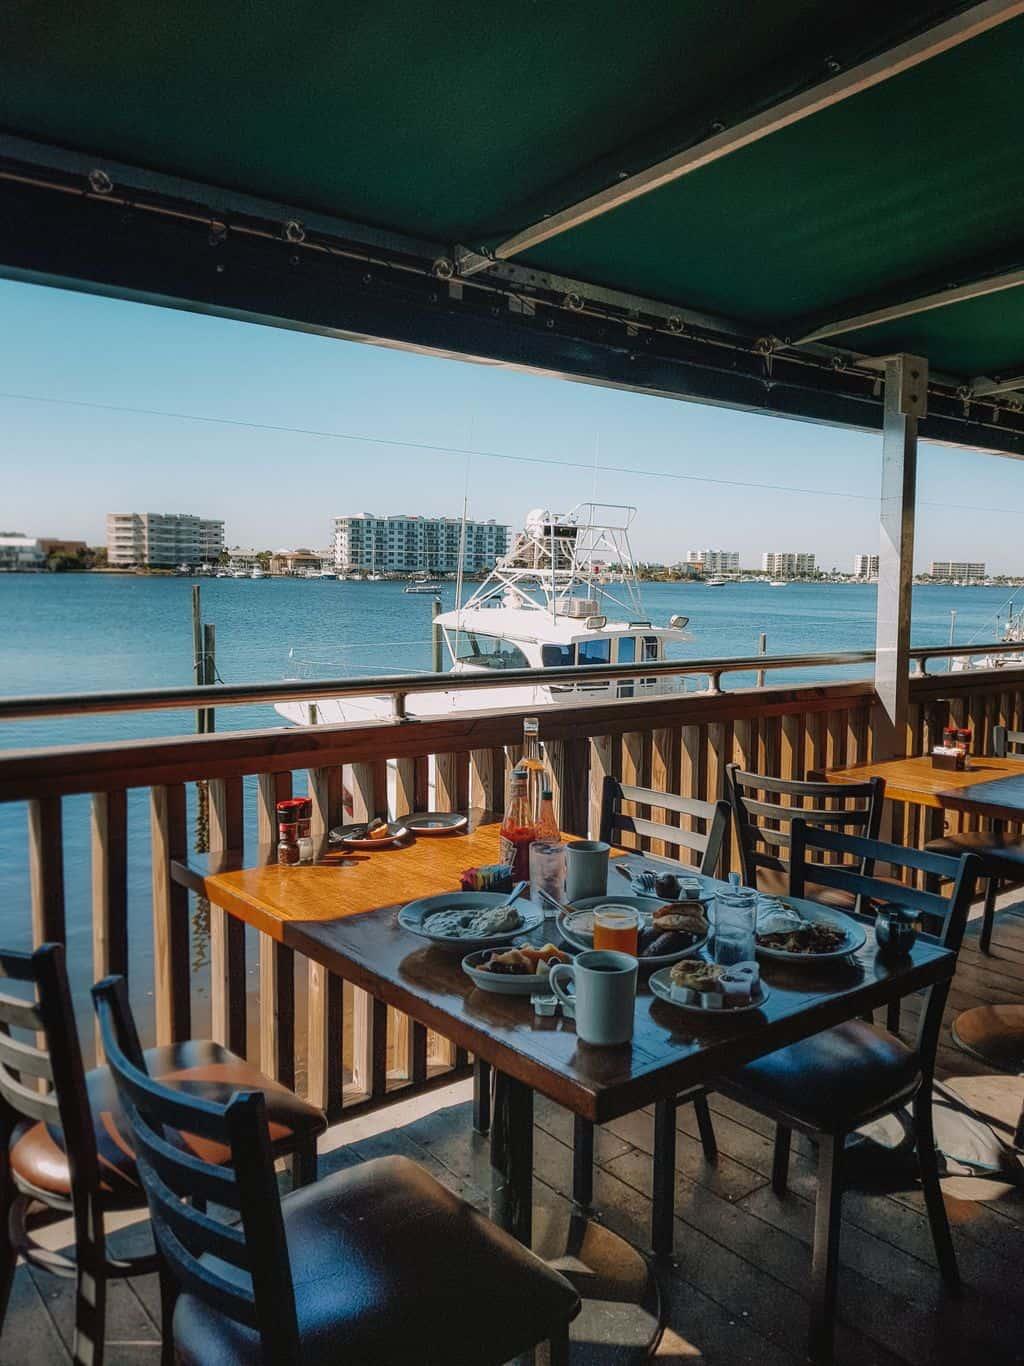 The 10 Best Restaurants On Florida\'s Emerald Coast • The Cutlery ...